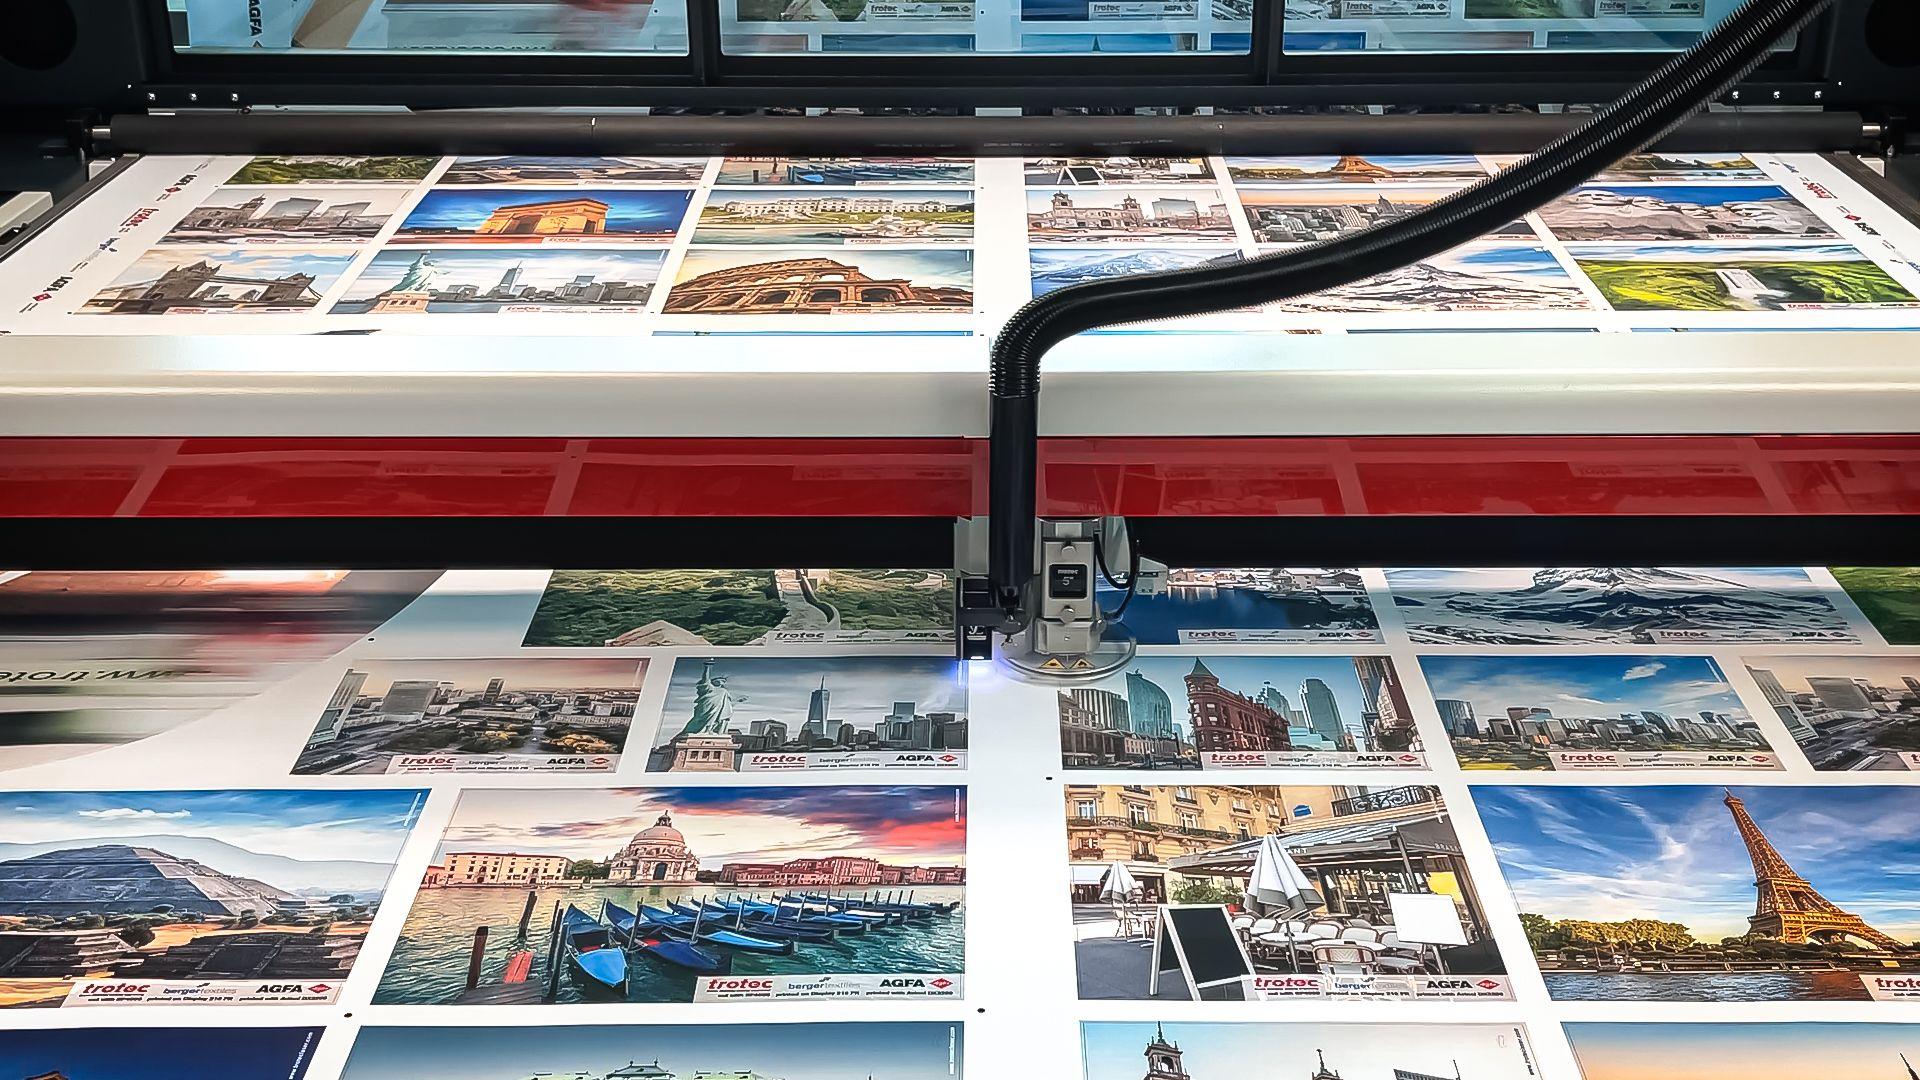 SP4000: Large Format Laser Cutter for Soft Signage Applications